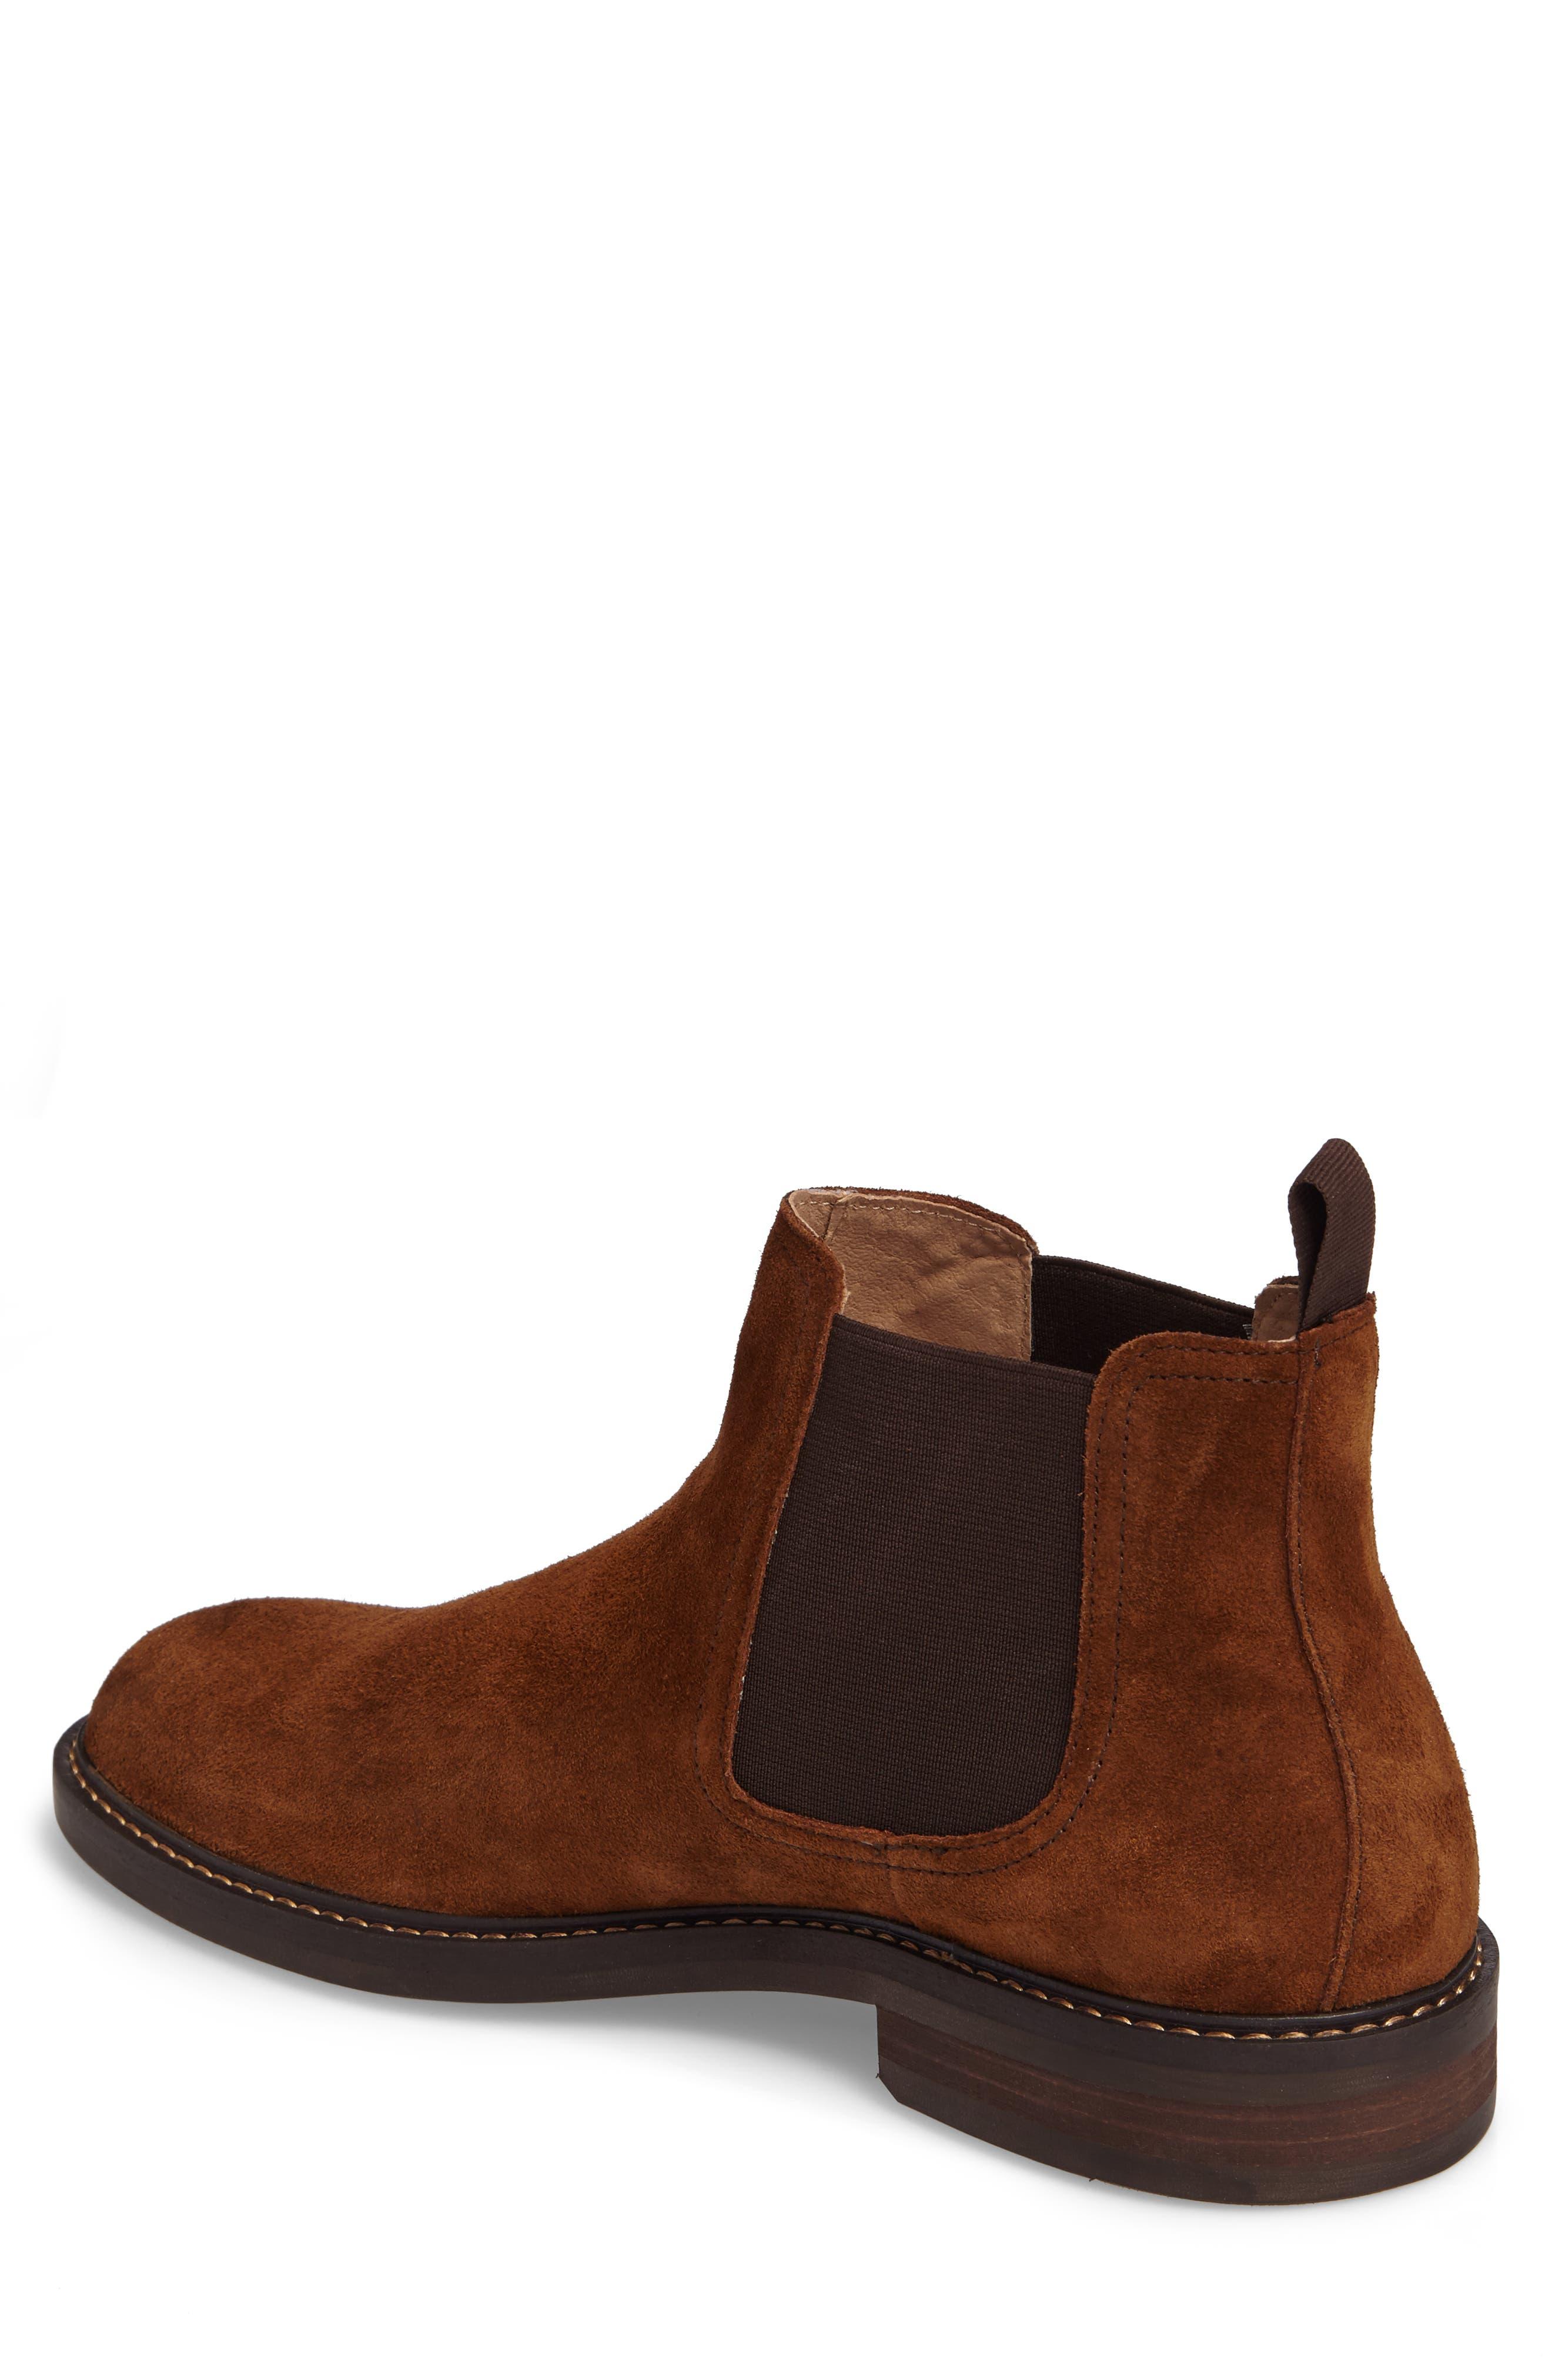 Horton Chelsea Boot,                             Alternate thumbnail 18, color,